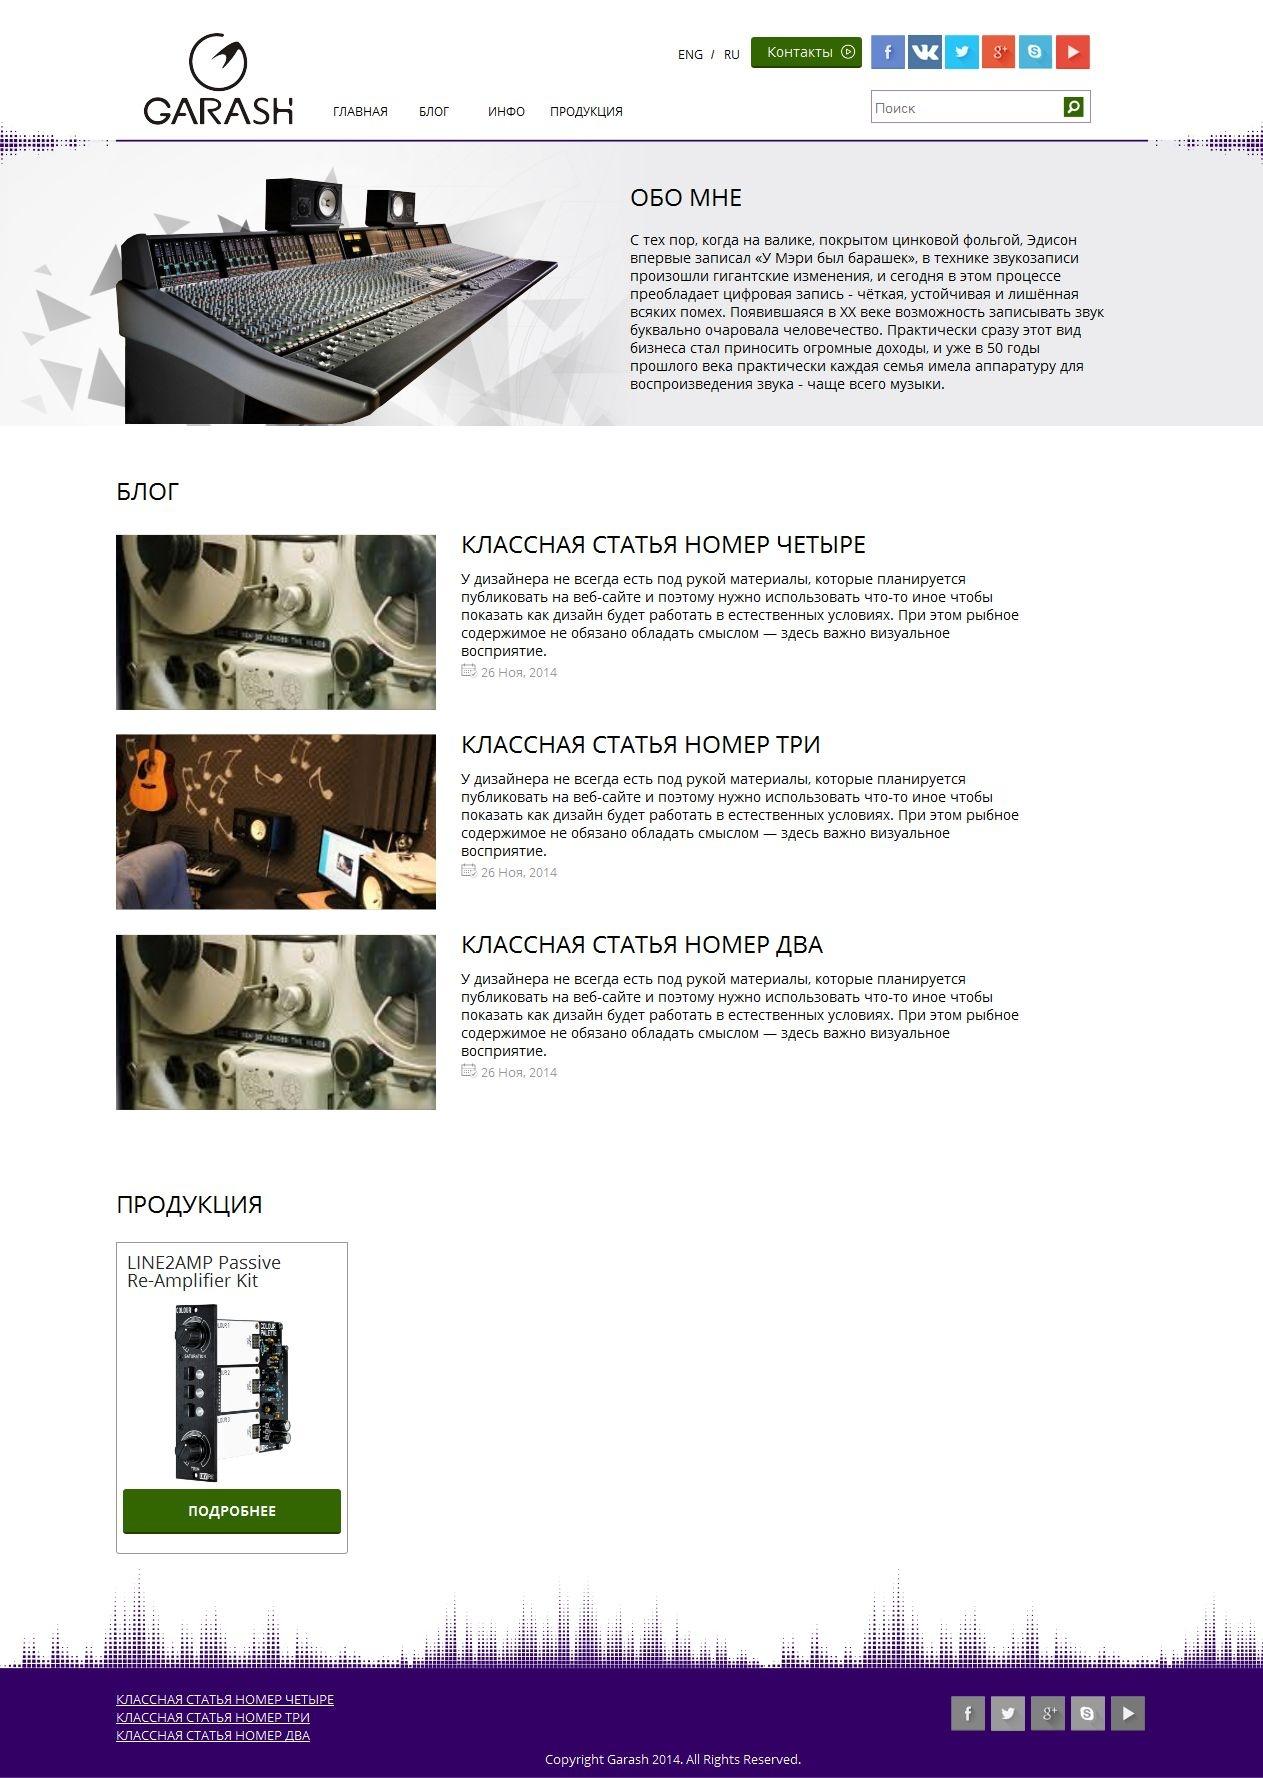 garashlab.ru - продажа звукового оборудования